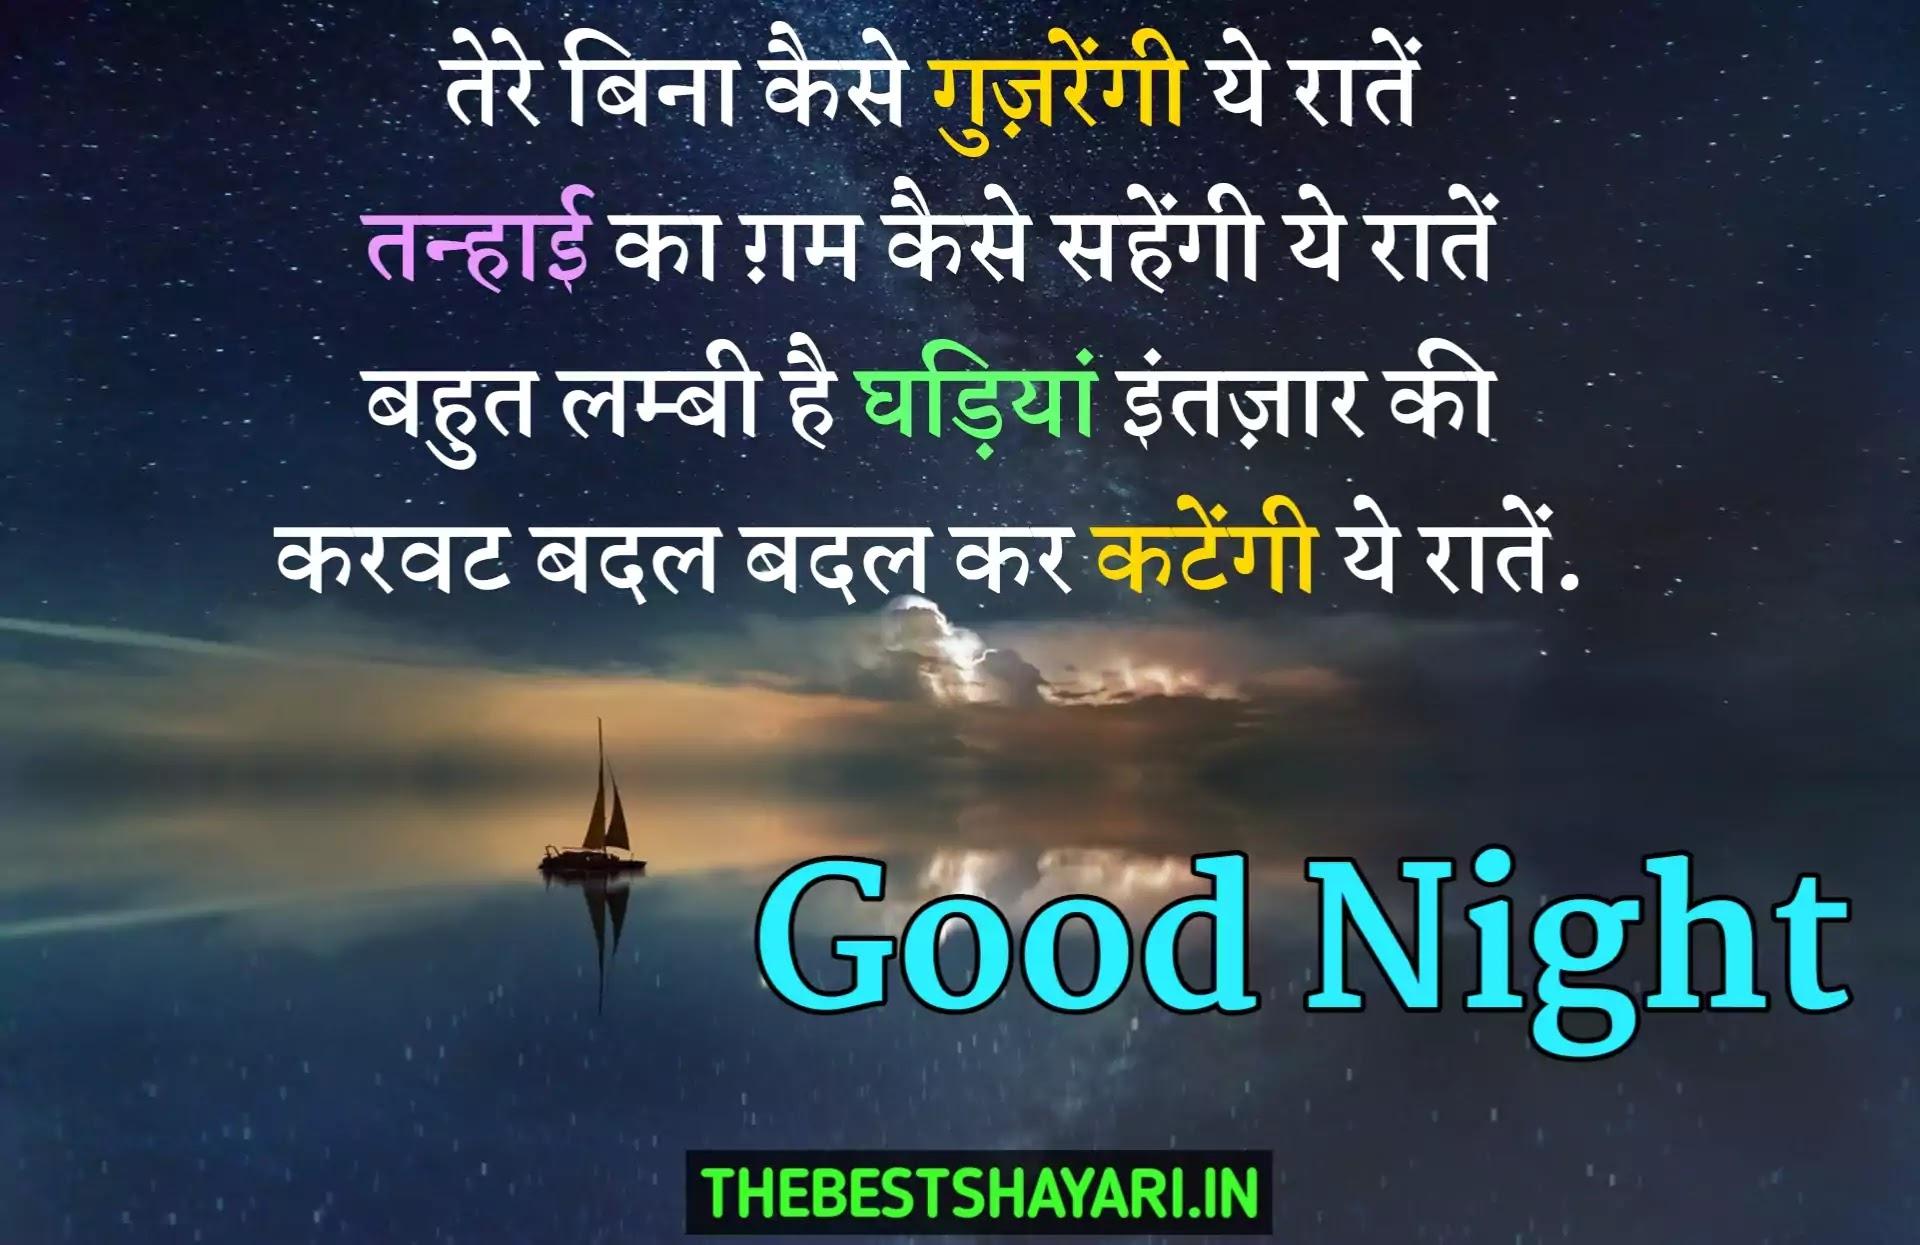 Good night love bhari shayari